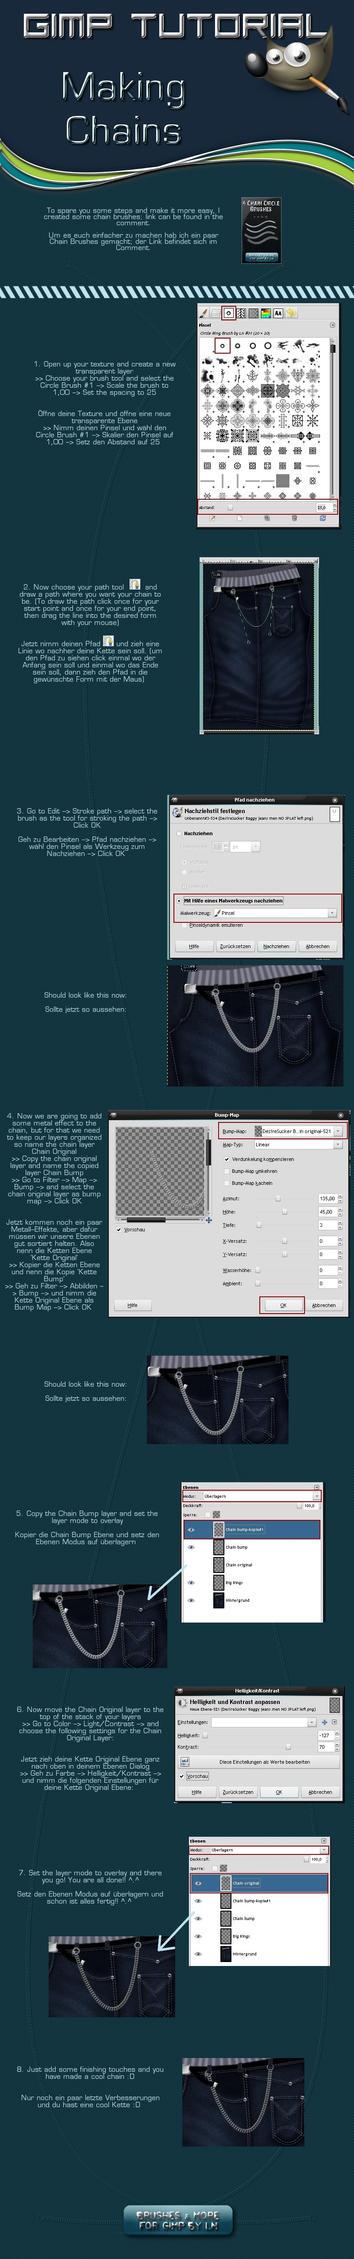 GIMP Circle Chain Tutorial by el-L-eN